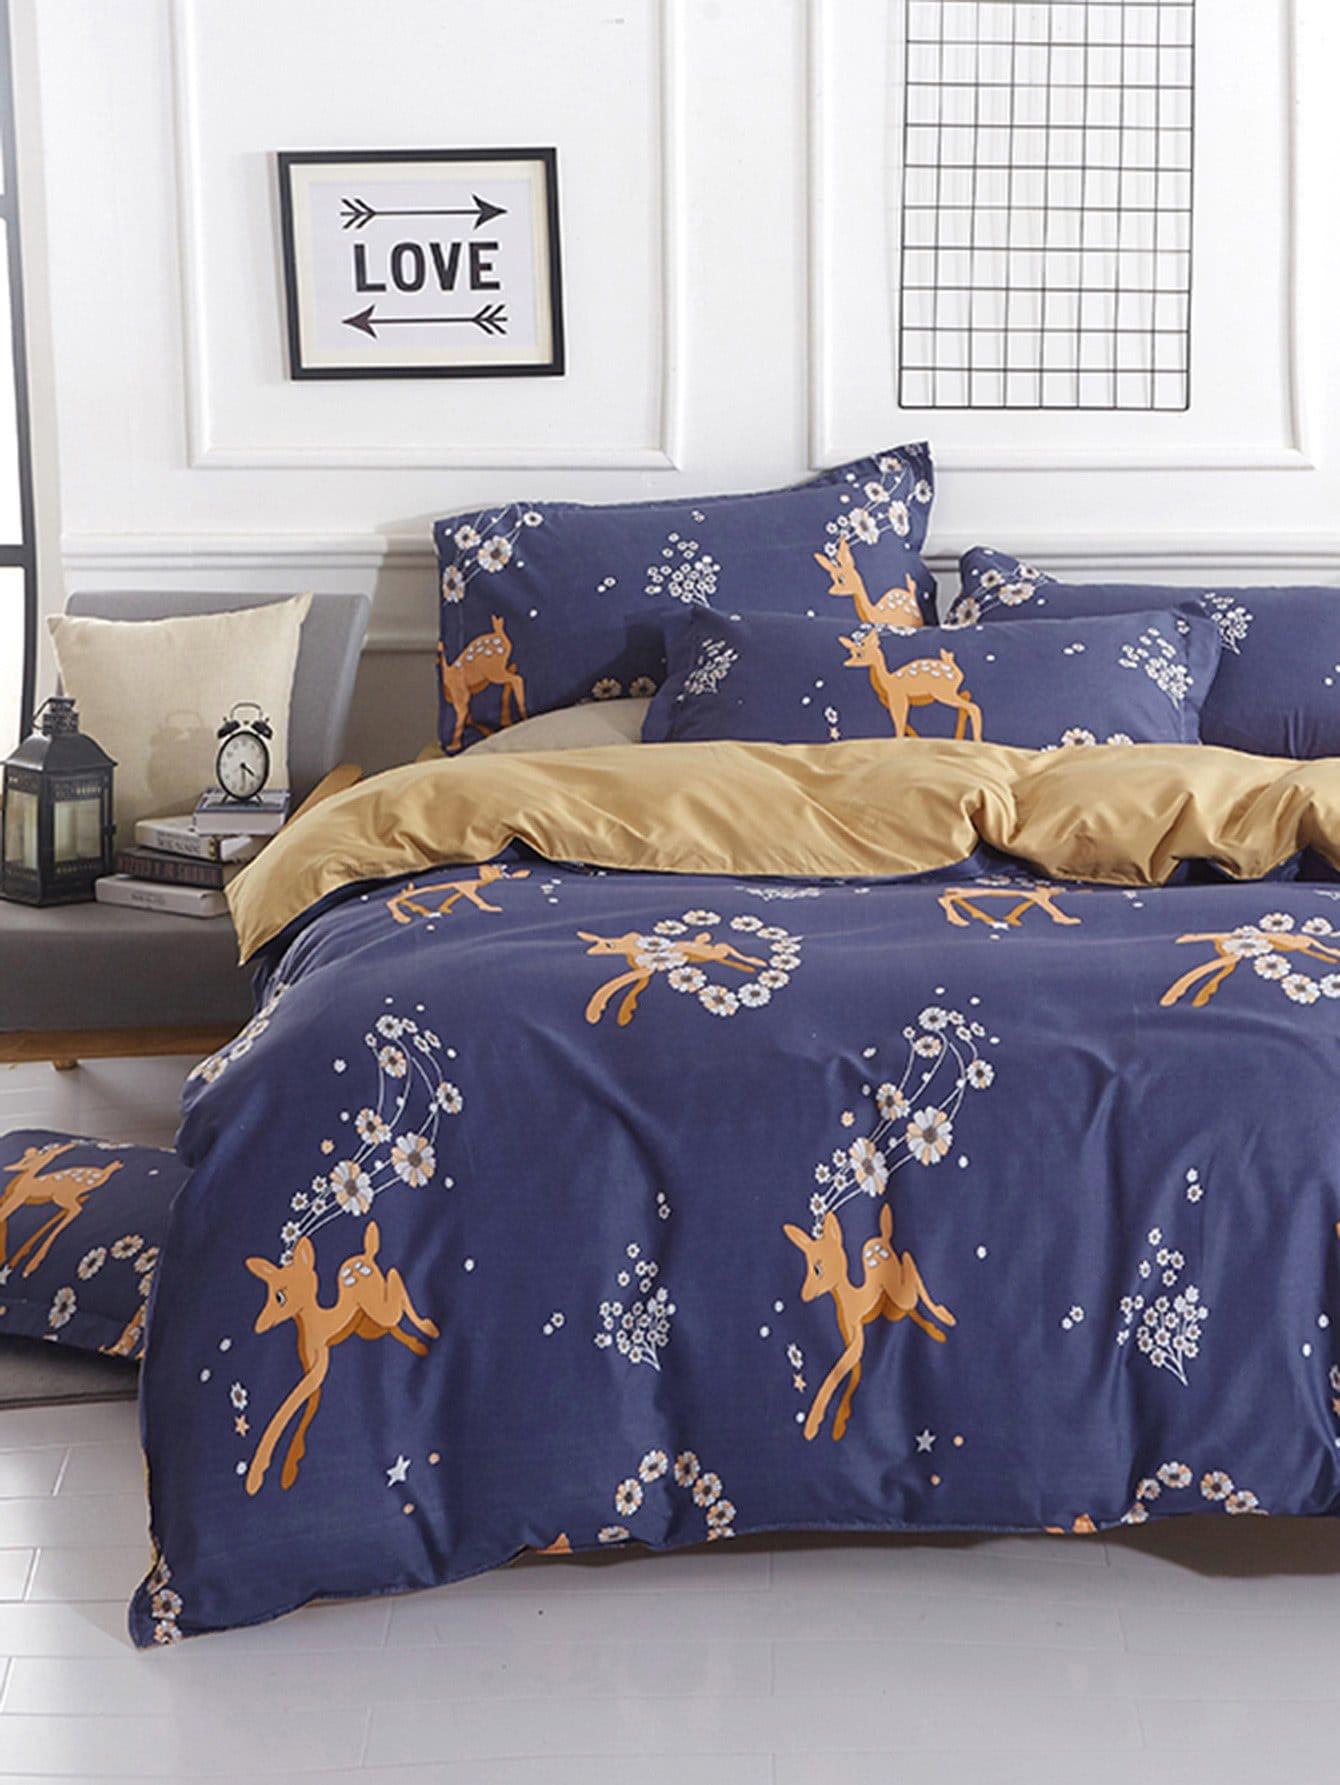 Deer & Flower Print Bedding Set flower print bedding set